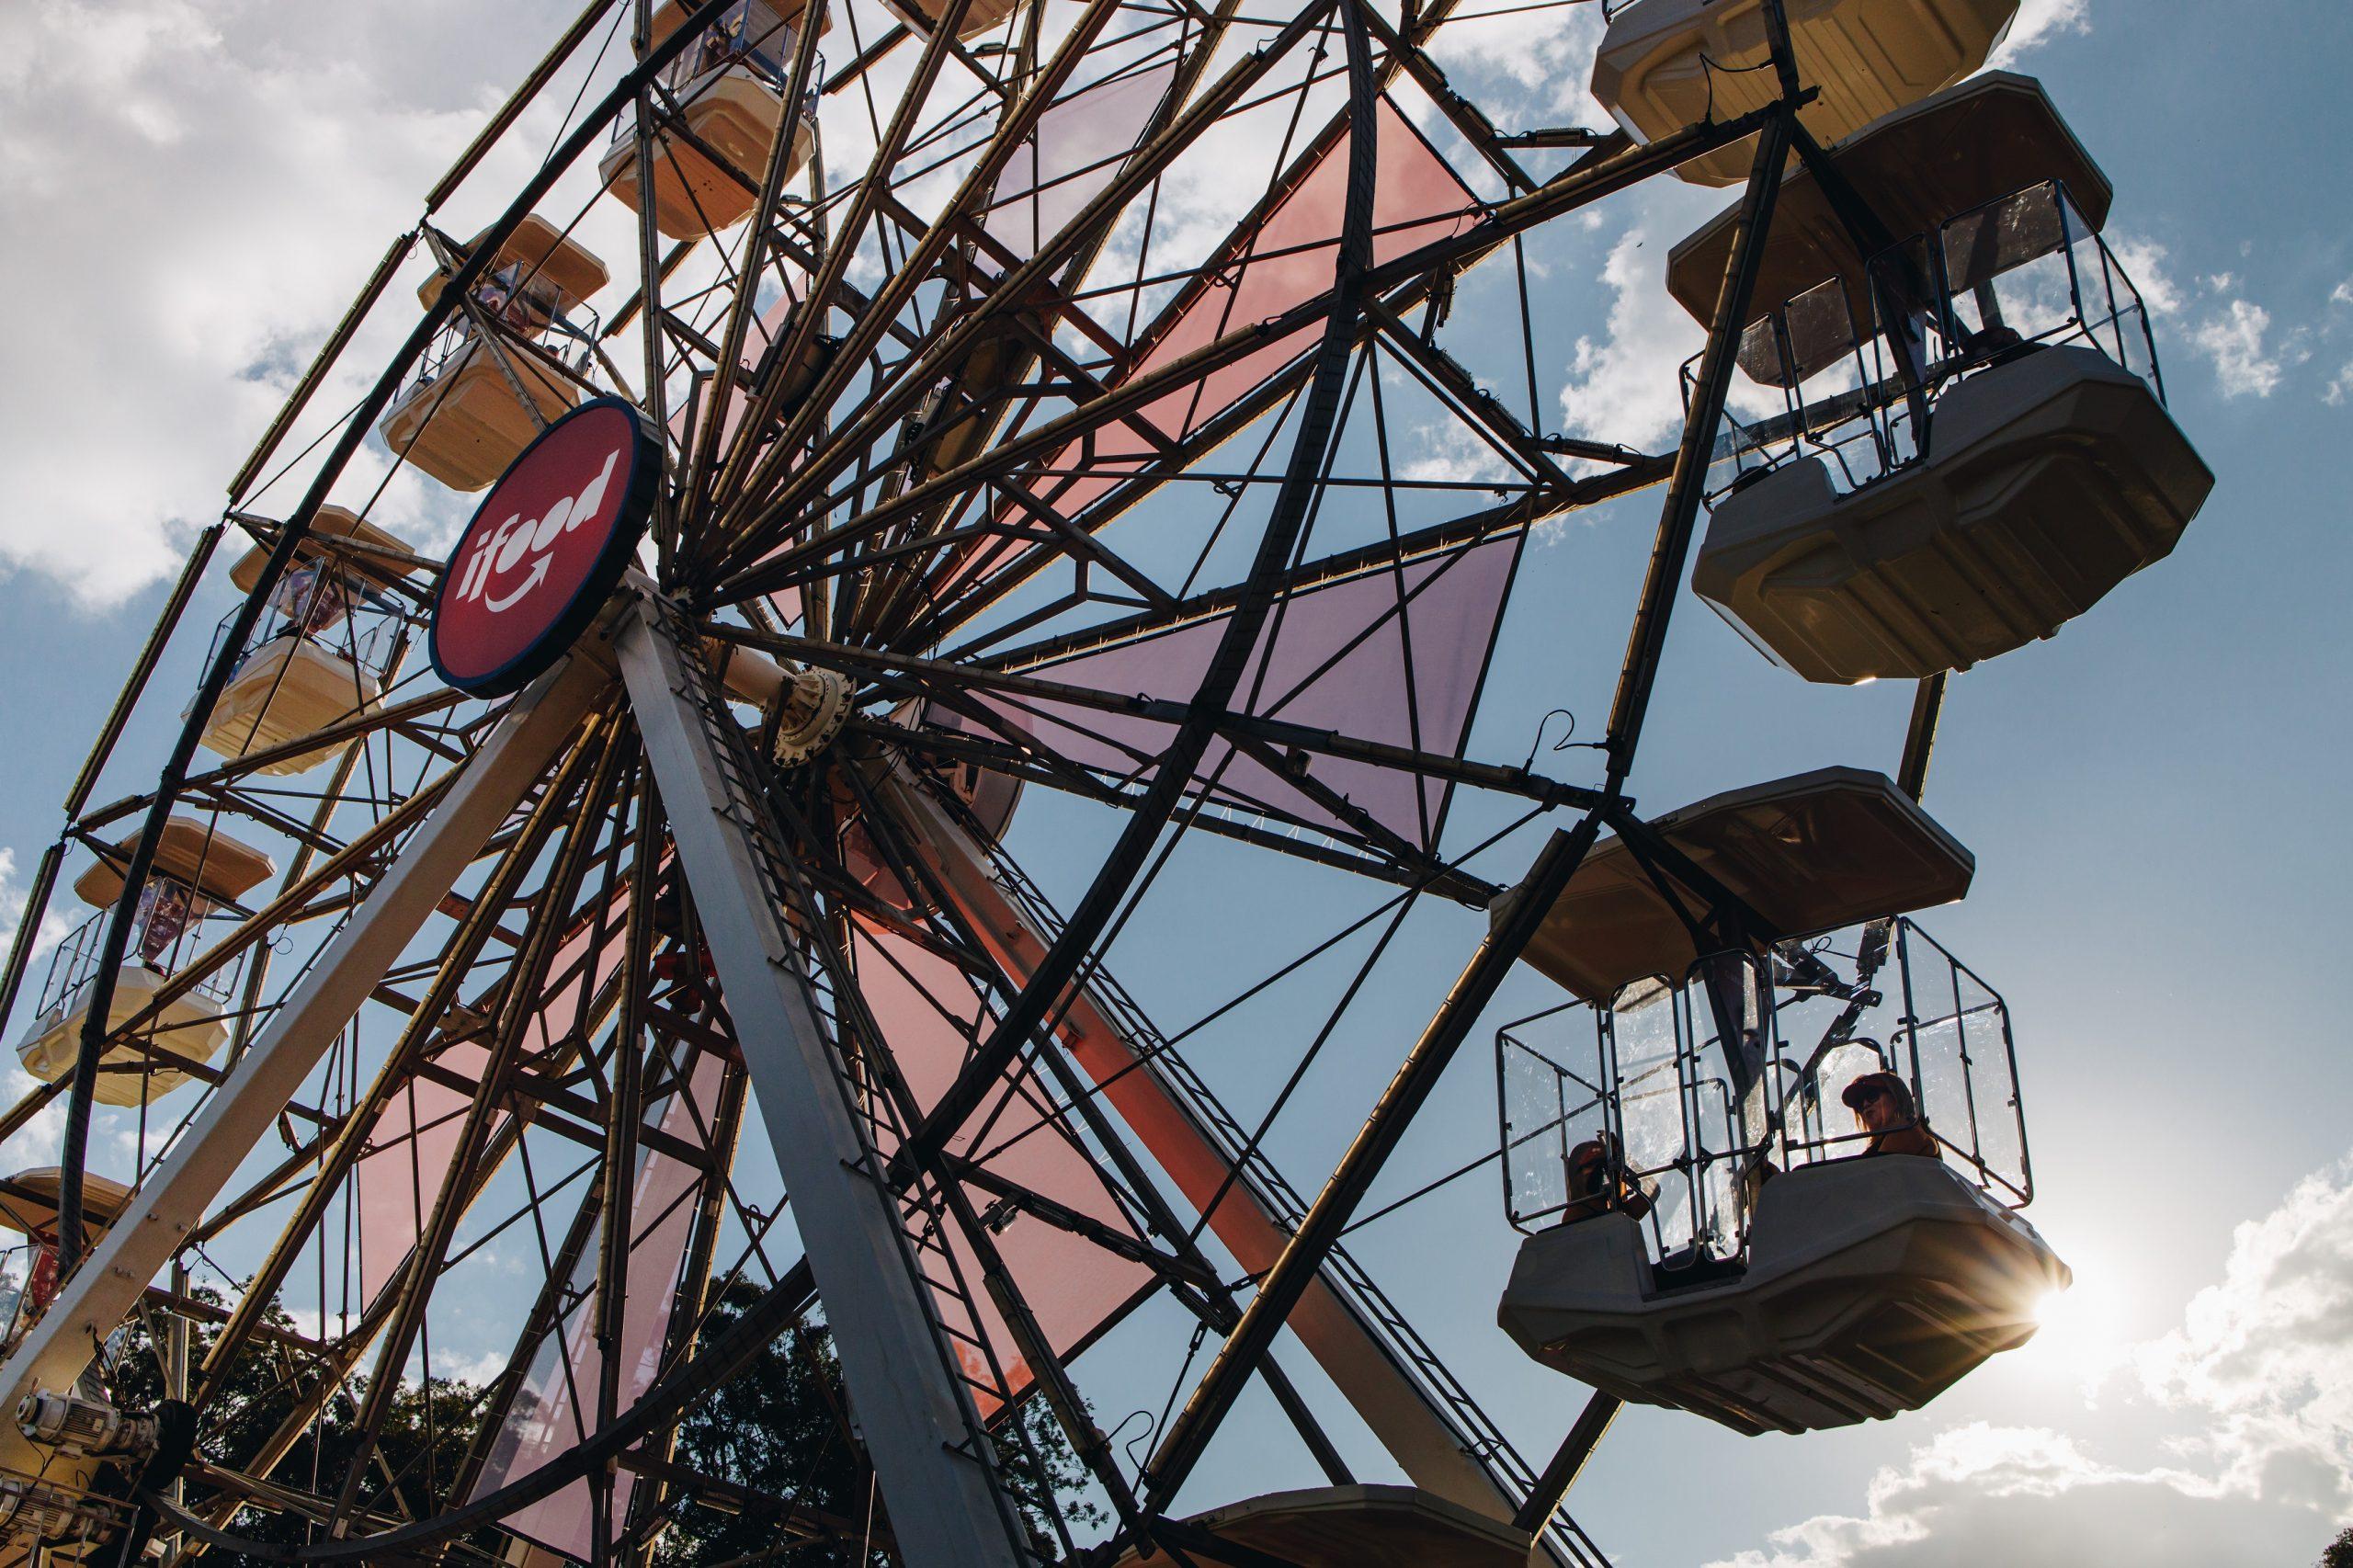 roda-gigante ifood no ibirapuera